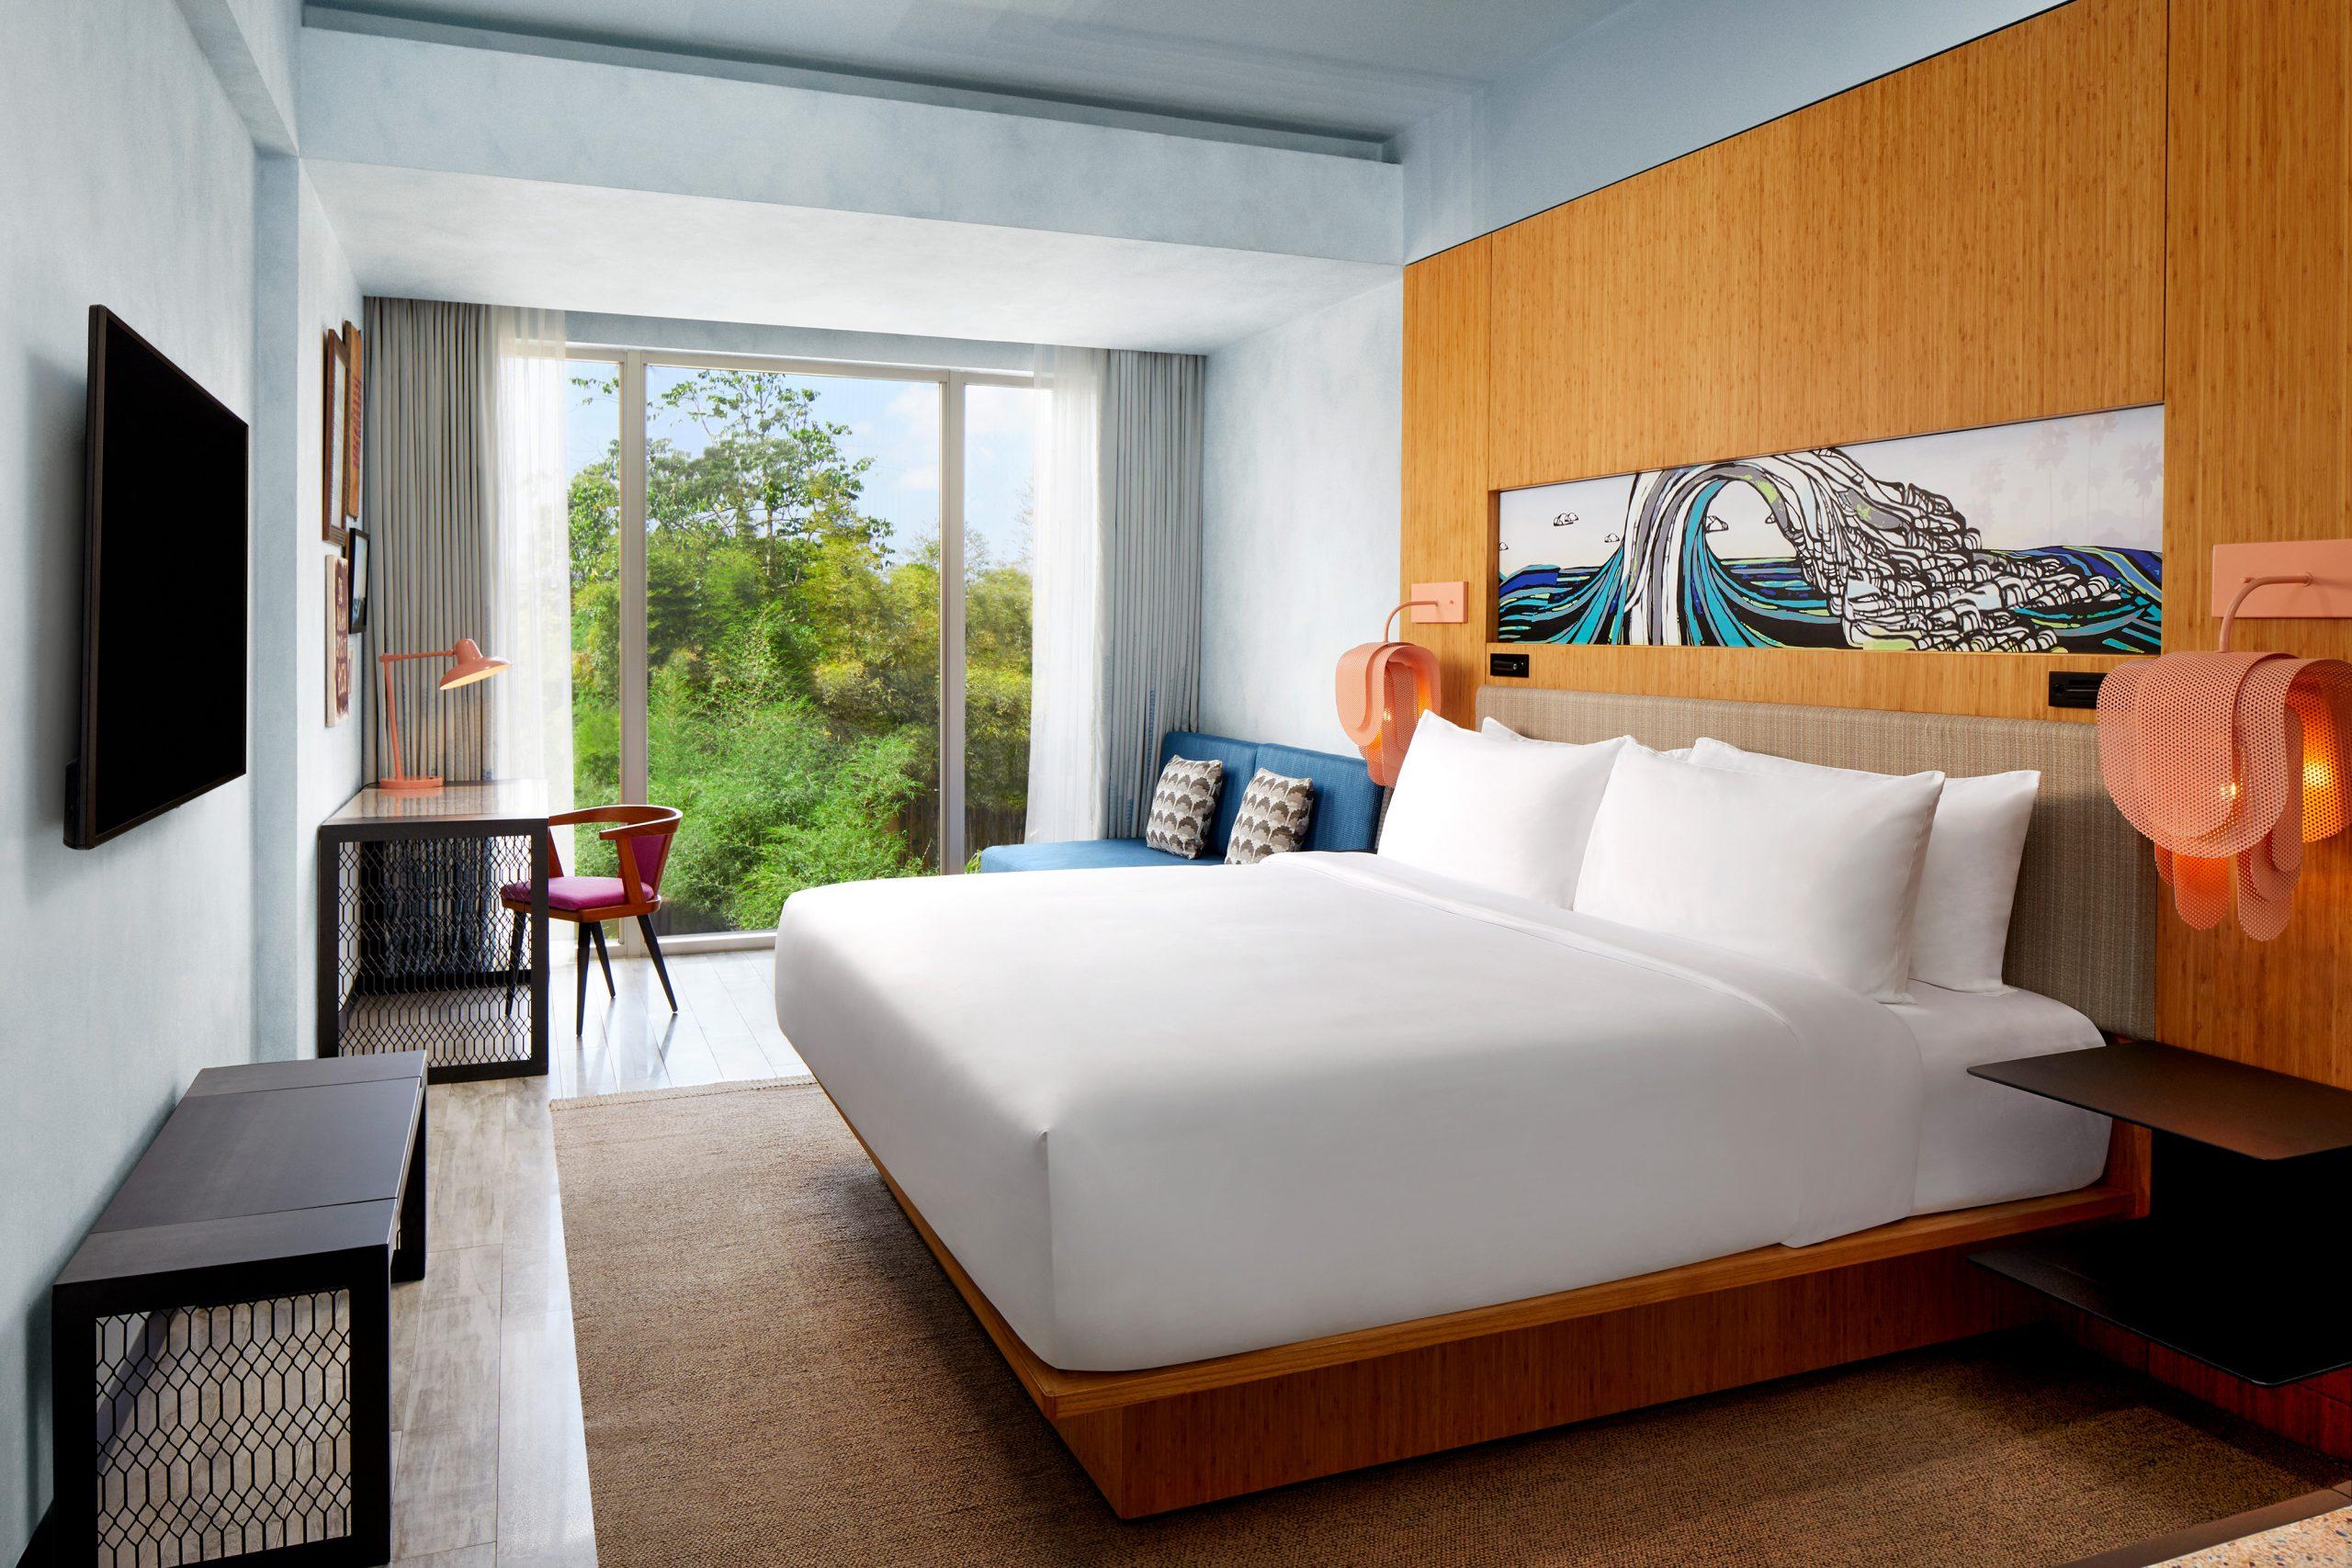 Sweet Escape Di Seminyak? Ini Tempat-tempat Yang Akan Ditemui Saat Menginap di Aloft Bali Seminyak